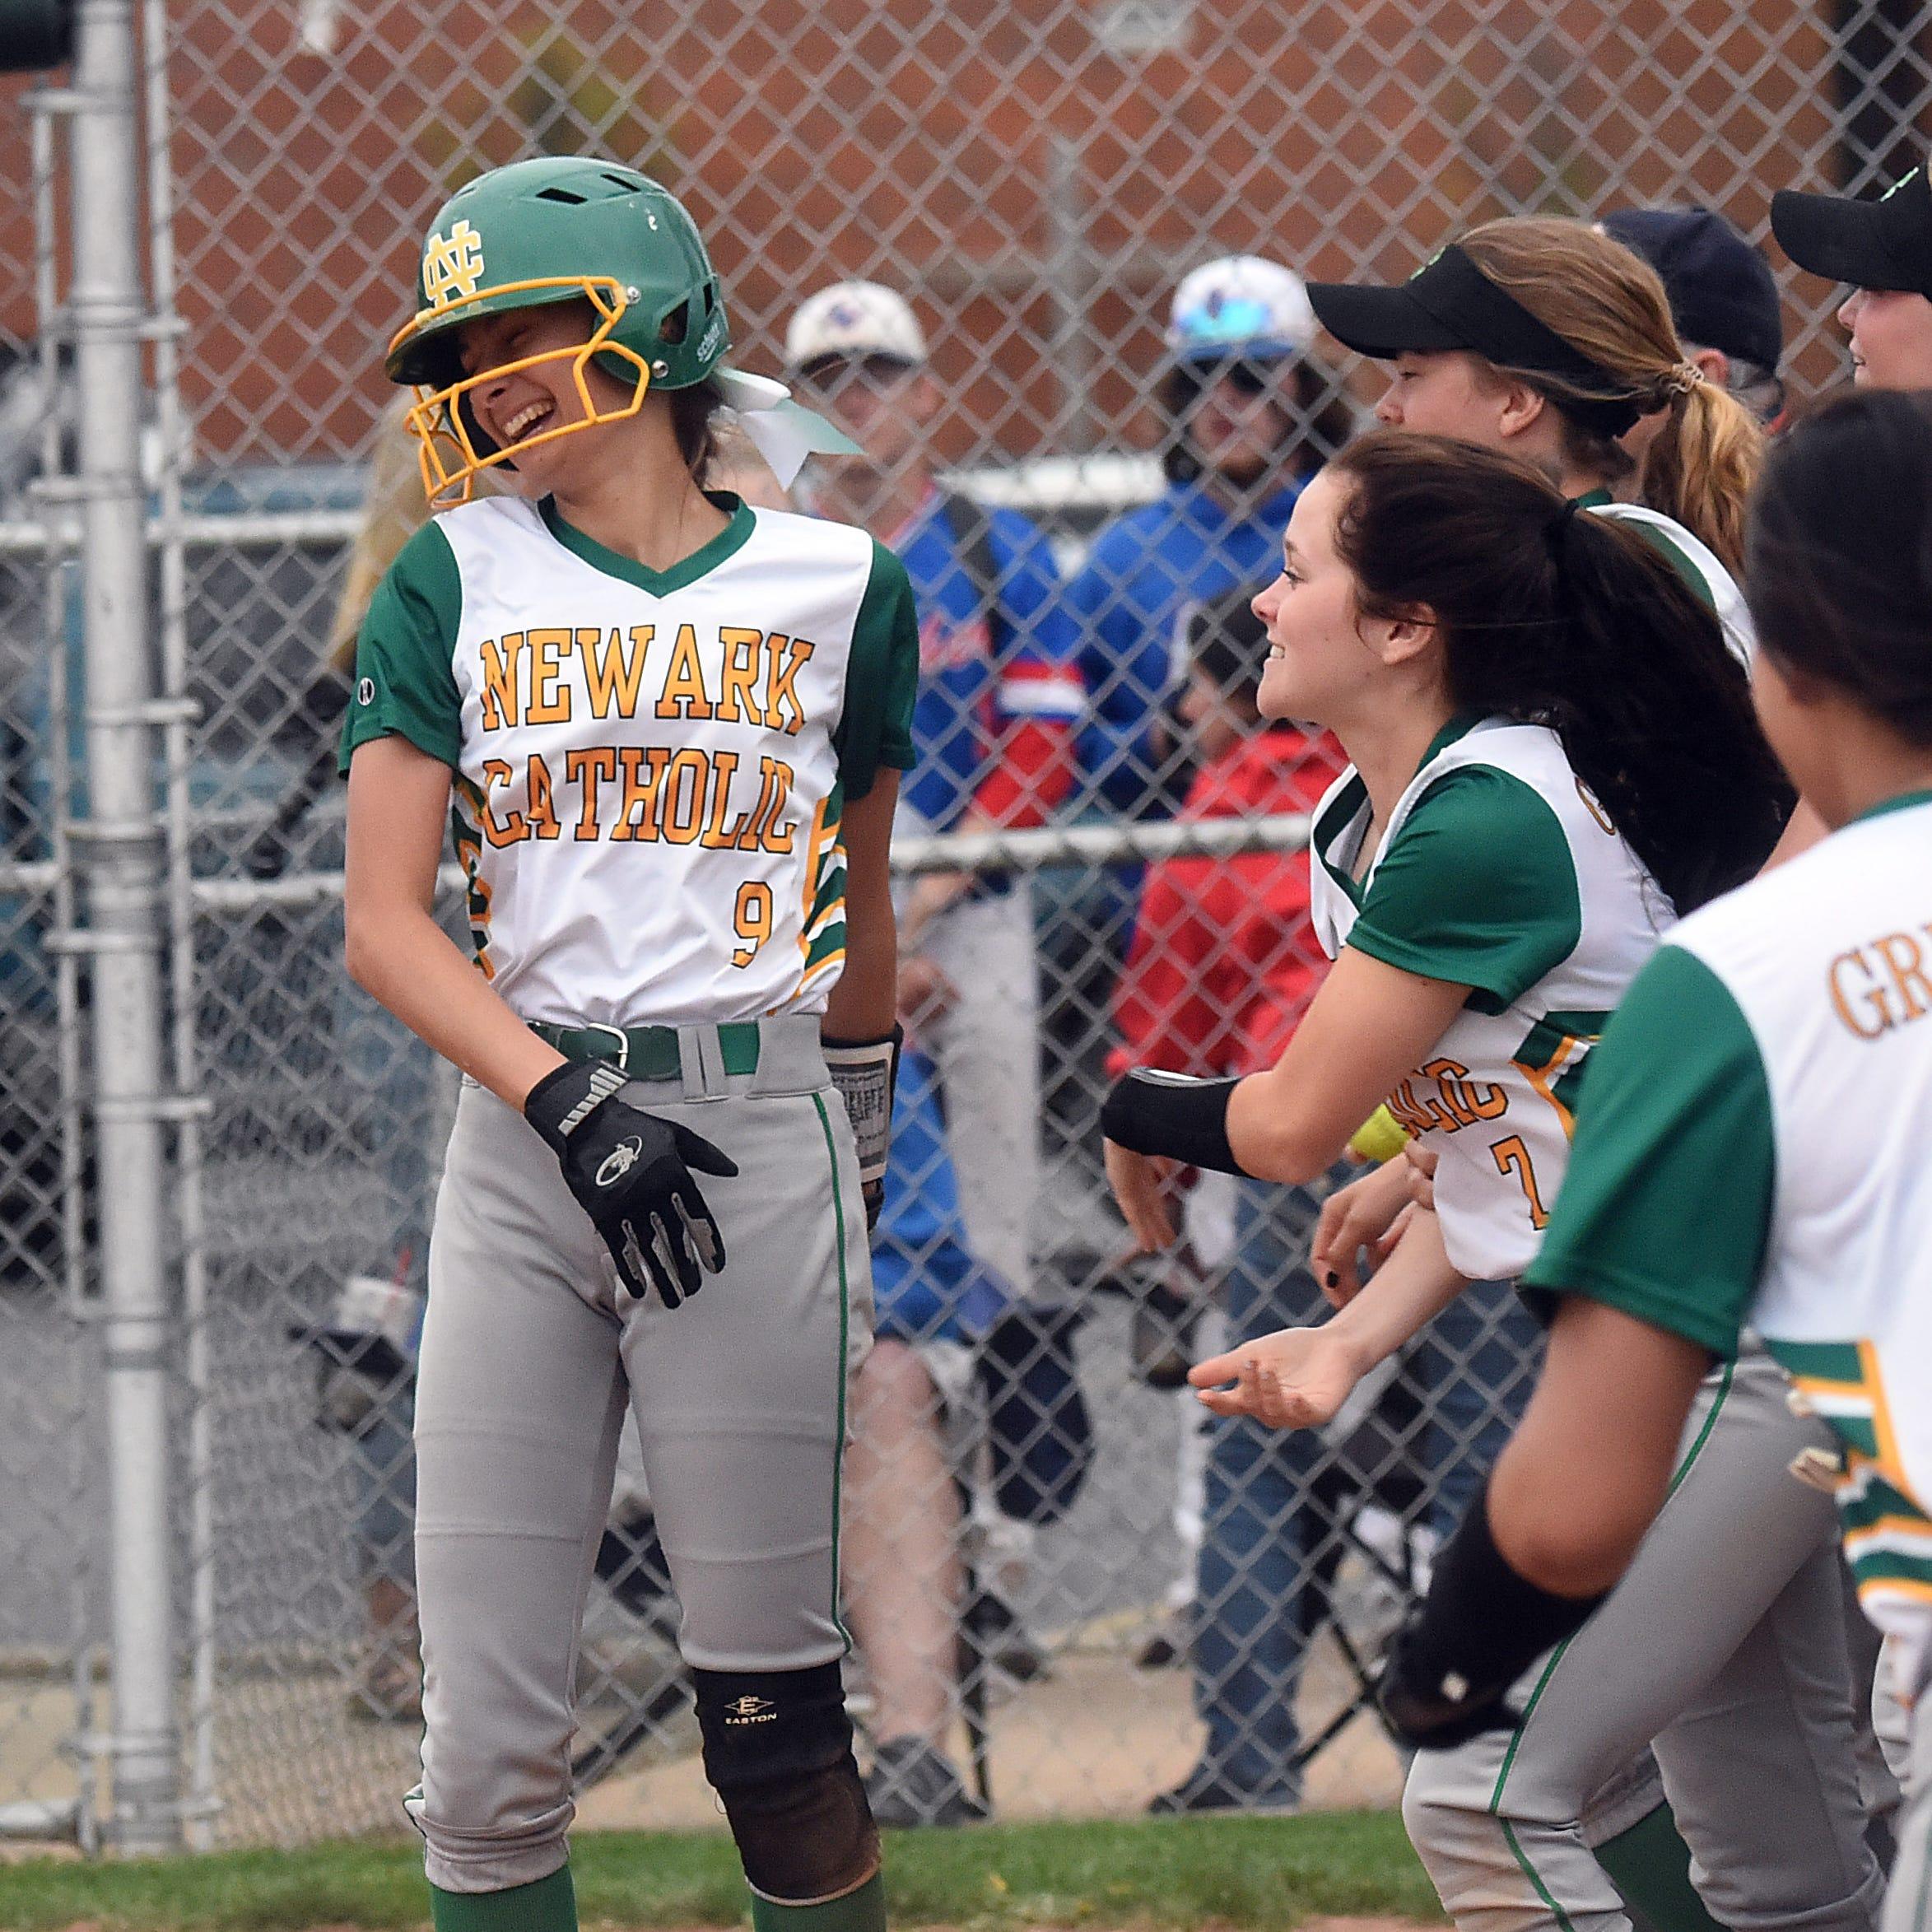 Determined Newark Catholic softball gets dramatic rivalry win